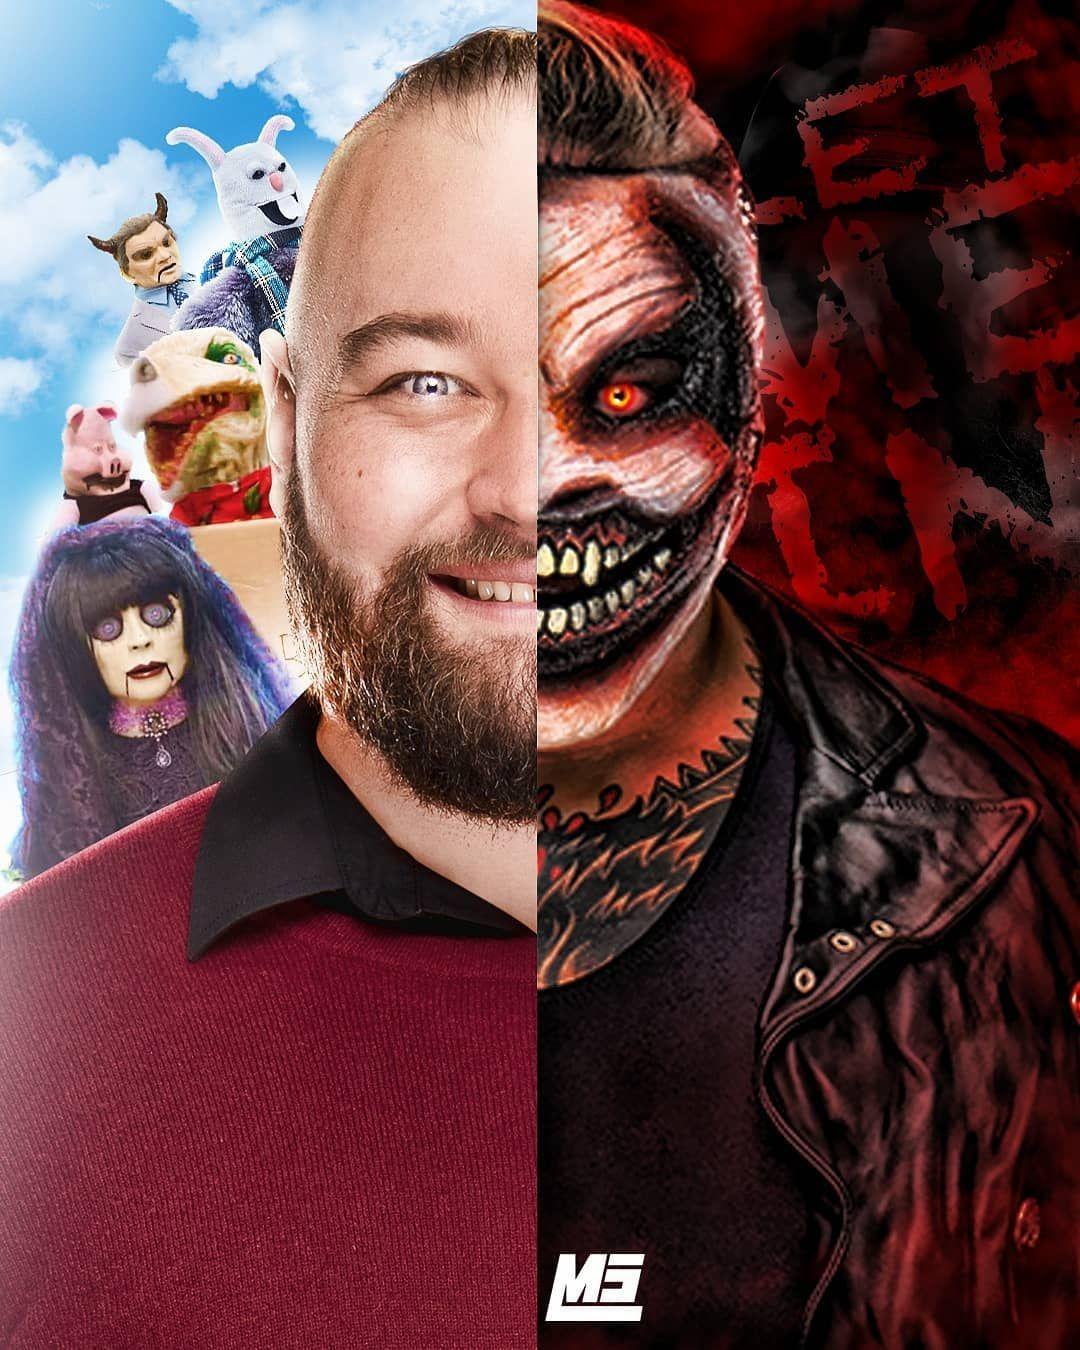 Pin by WWE AND AEW on WWE in 2020 Wrestling wwe, Wwe